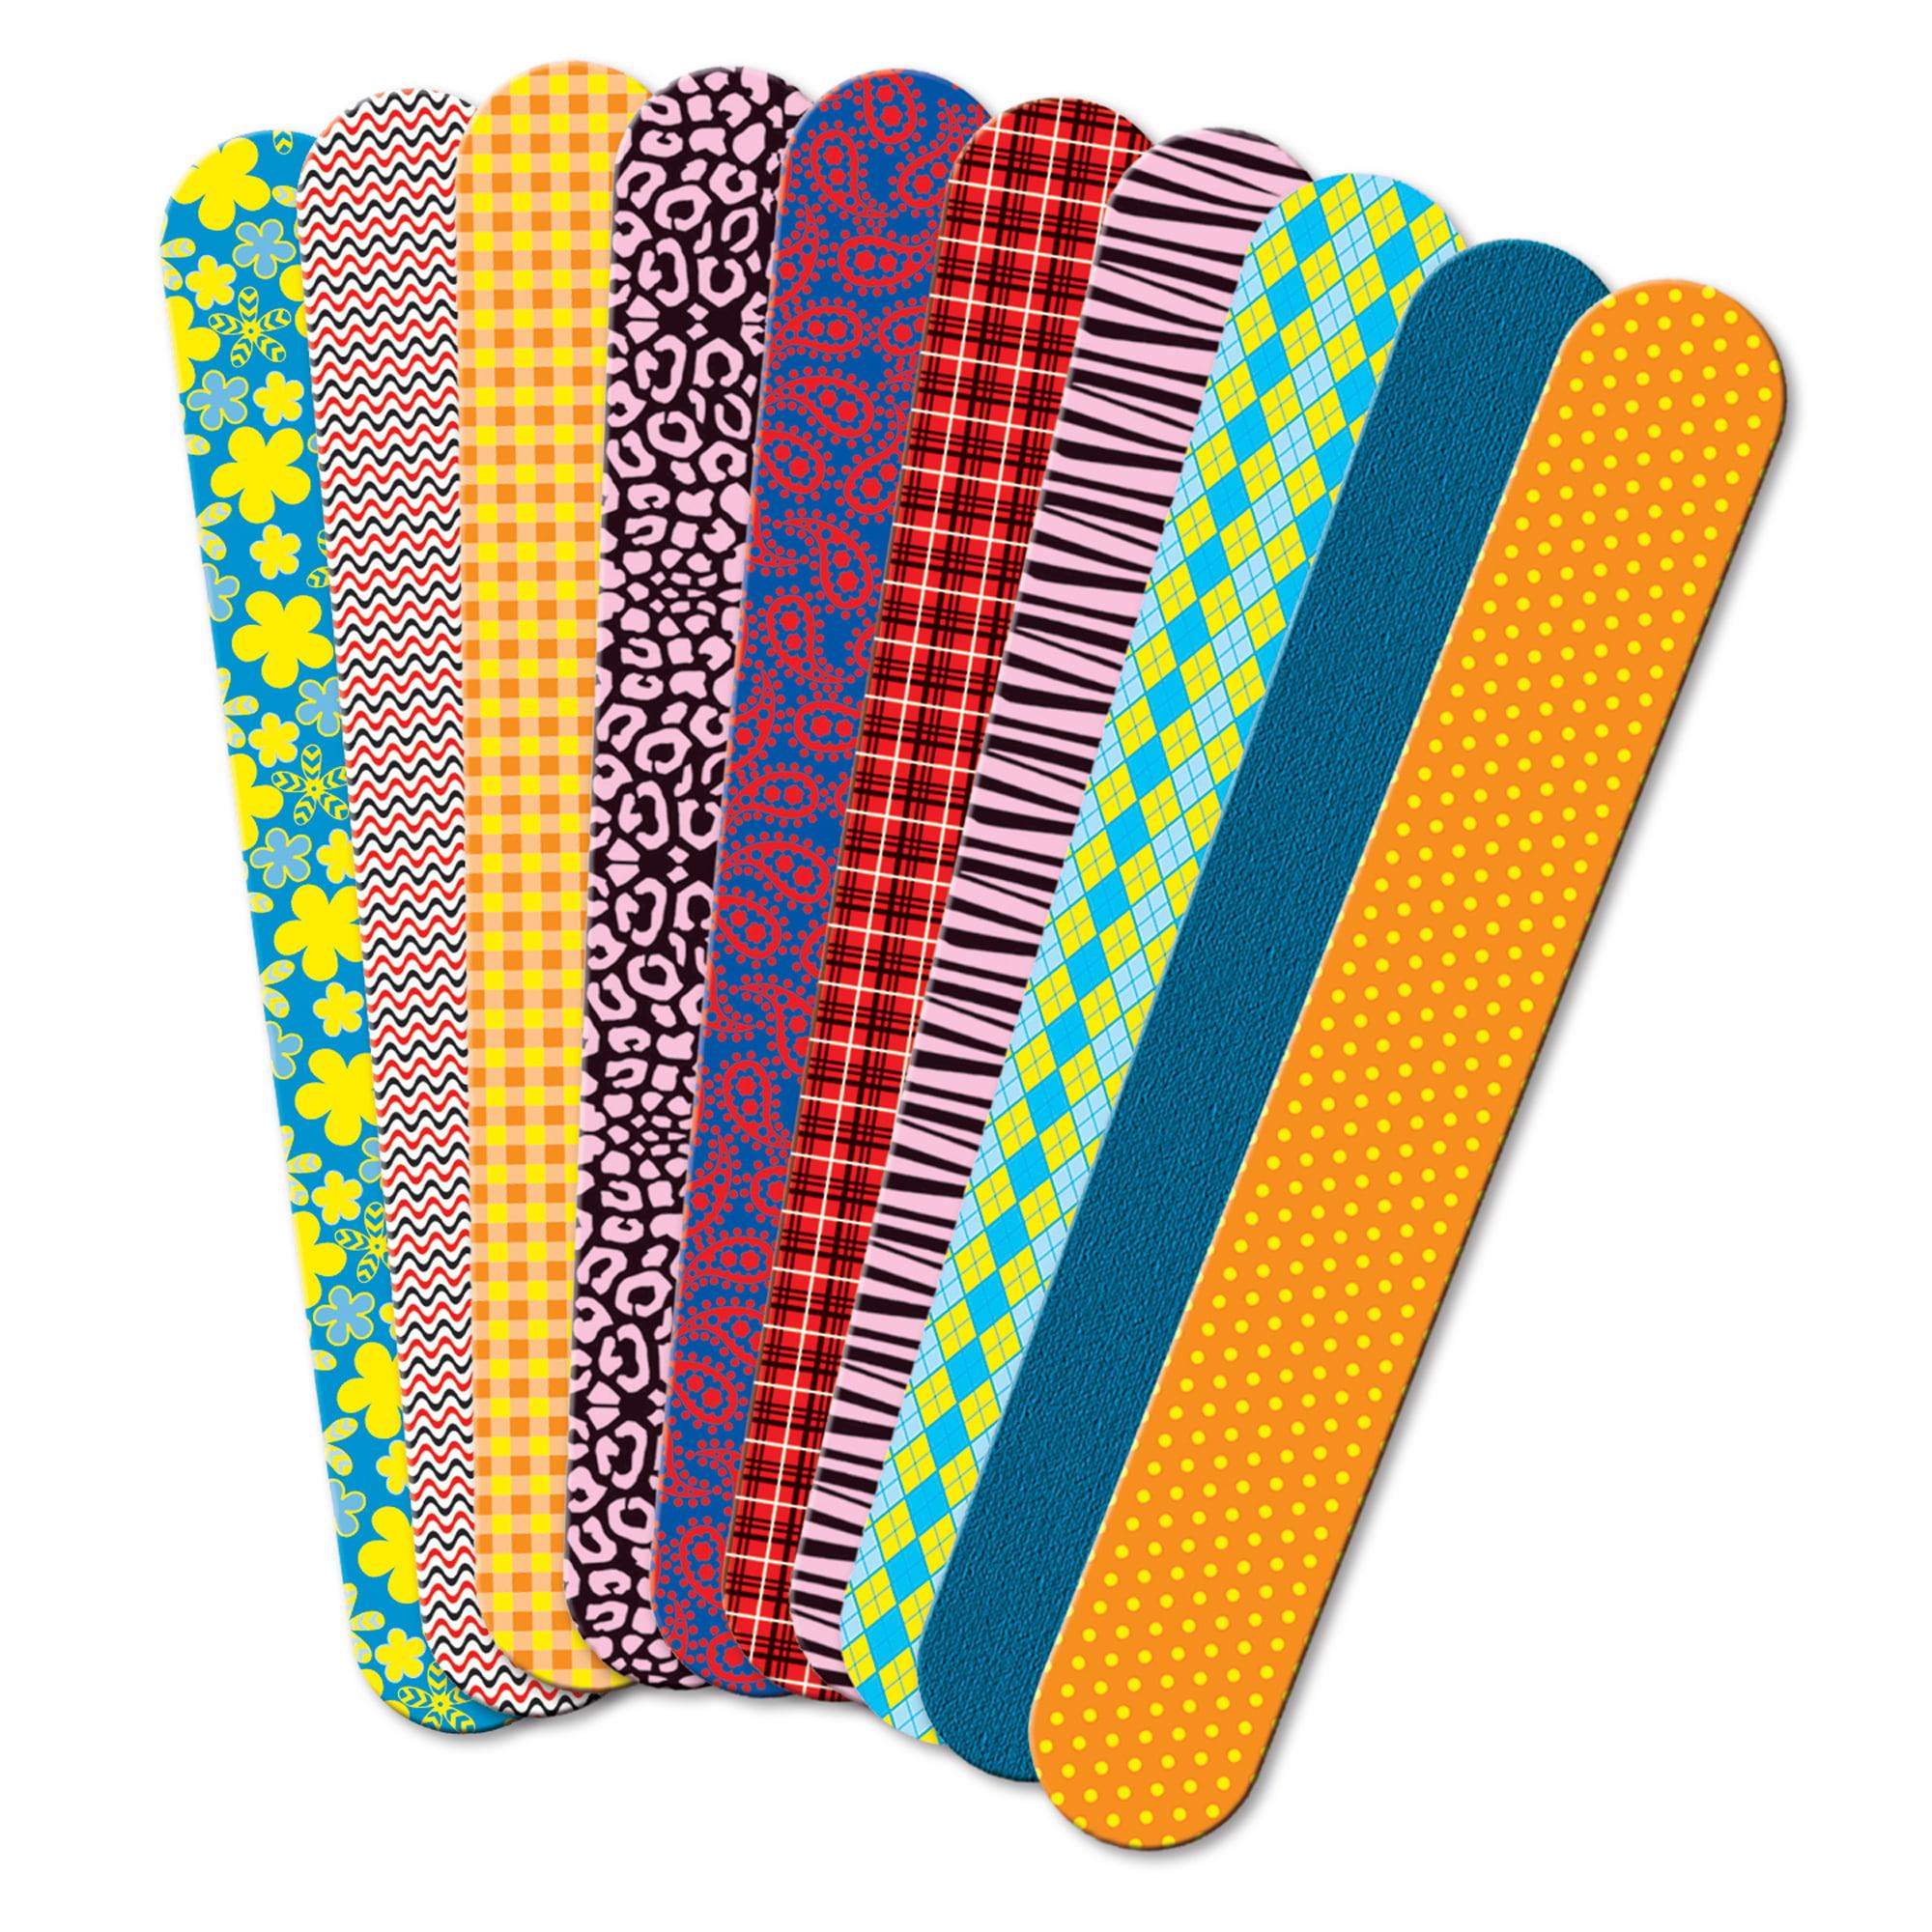 Roylco® Printed Craft Sticks, Fabric Prints, 50 per pack, Set of 6 packs